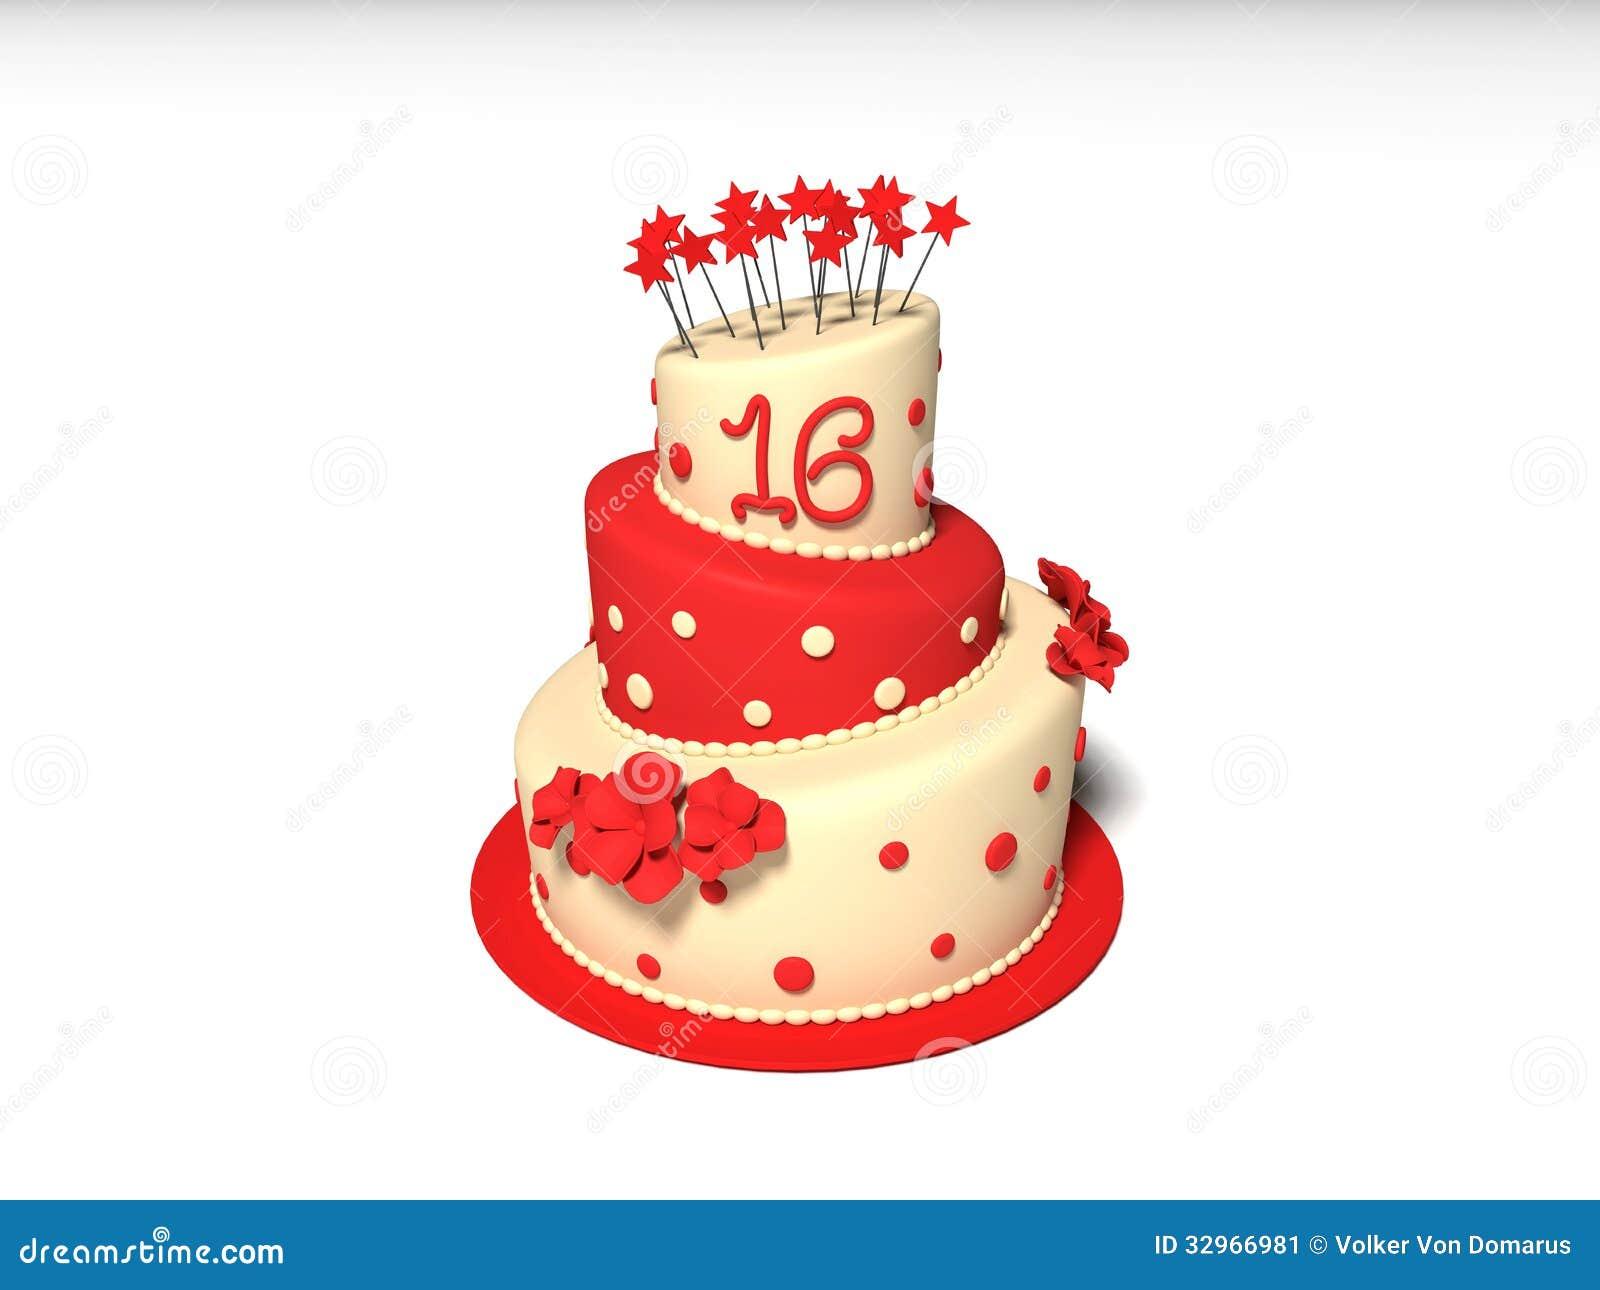 Birthday Cake Stock Image - Image: 32966981